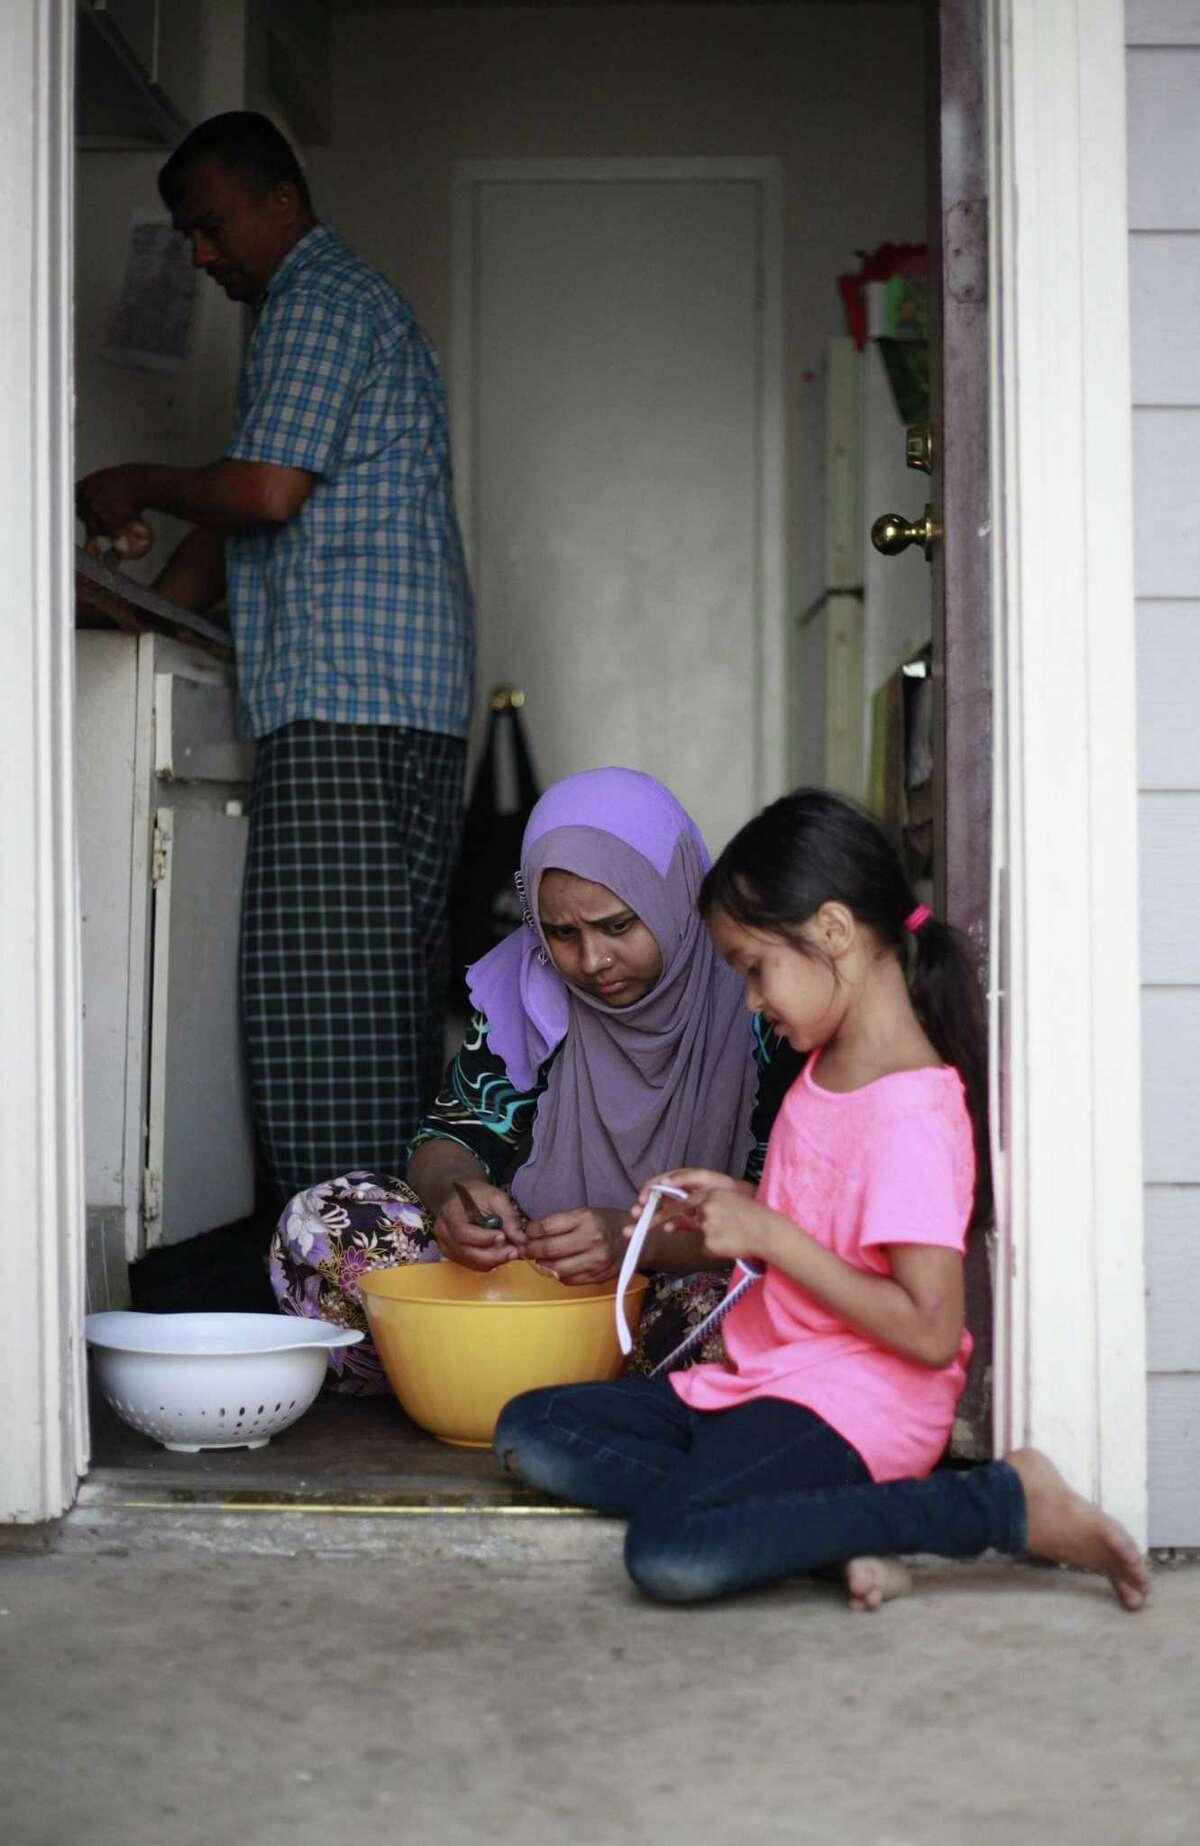 Siti Nur Anisha Binti Mohamad Rashid, 7, shows her mother Saidah Binti Yasin her heart-shaped sunglass as her mother and her father Mohamad Rashid Bin Nurislam prepare dinner.